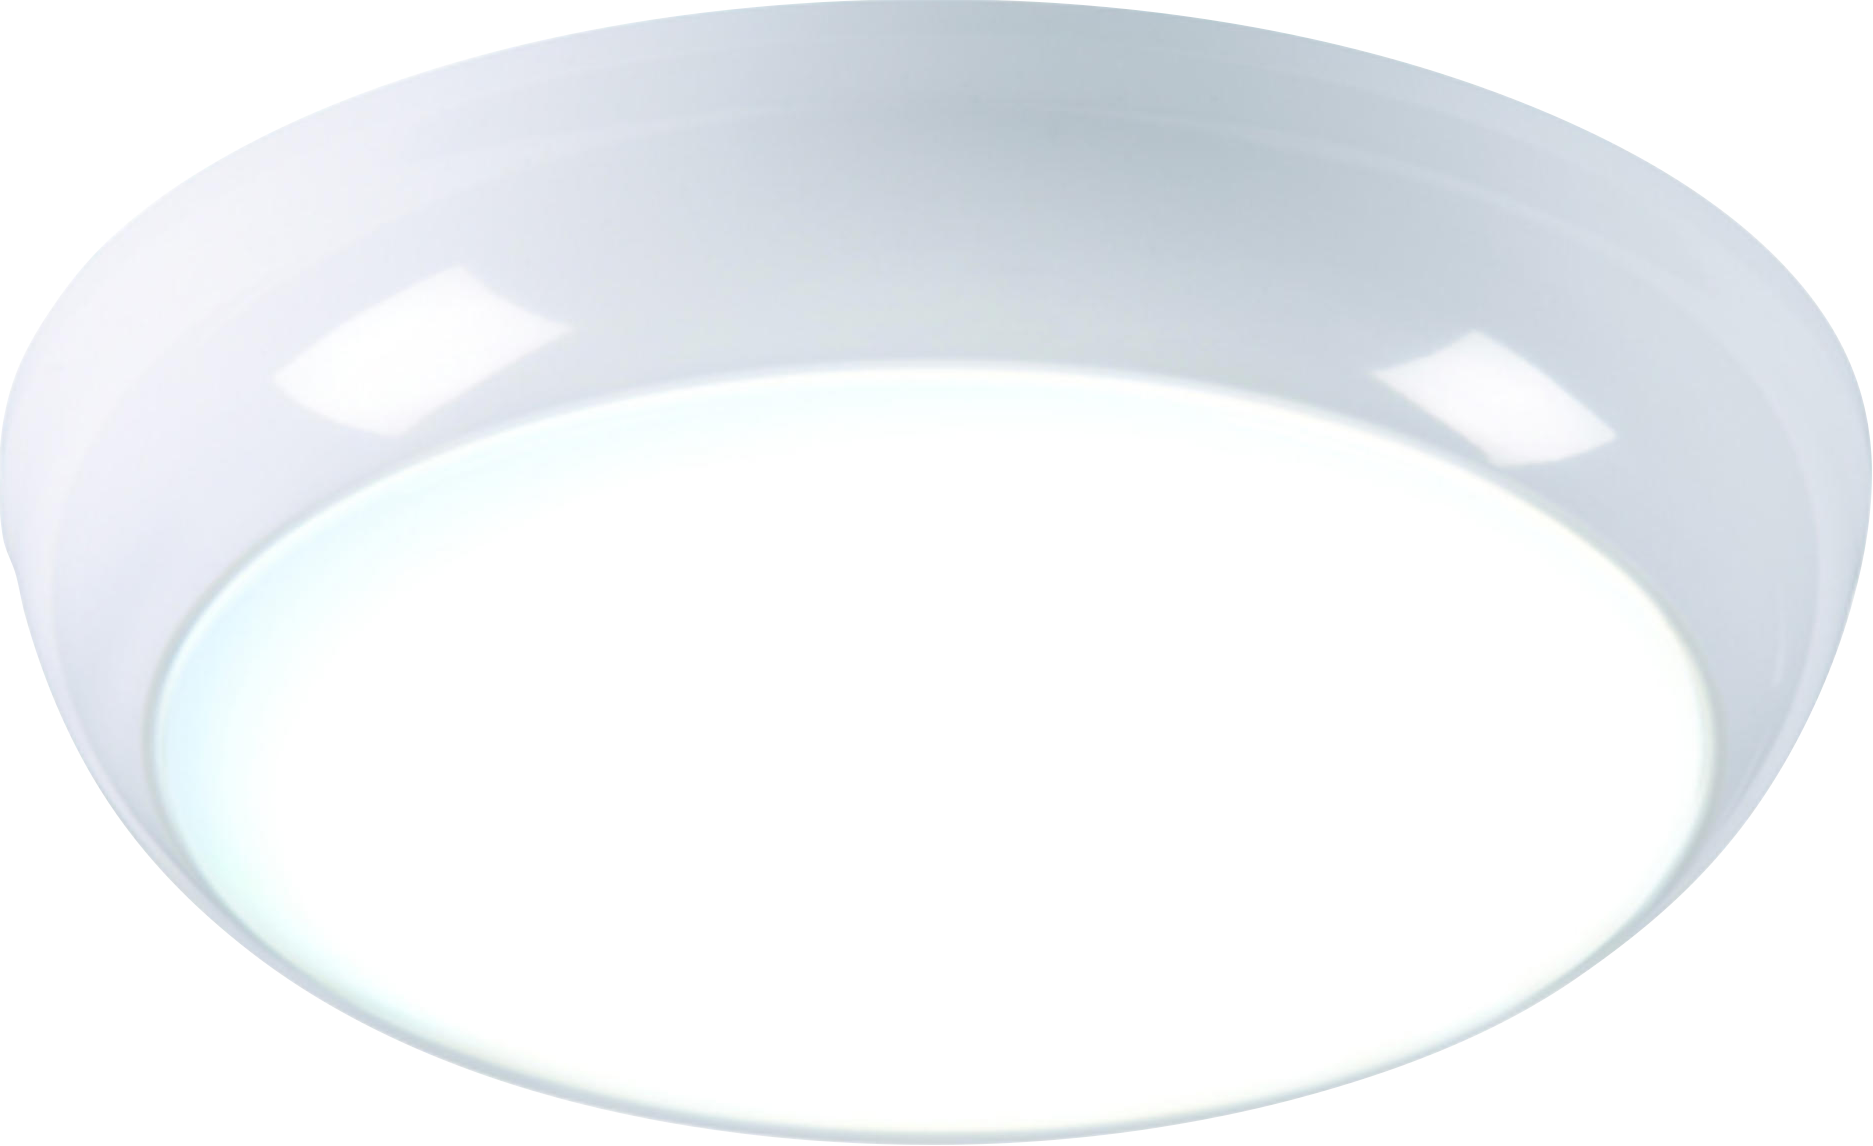 230V IP44 14W LED Emergency Bulkhead Fitting 6000K